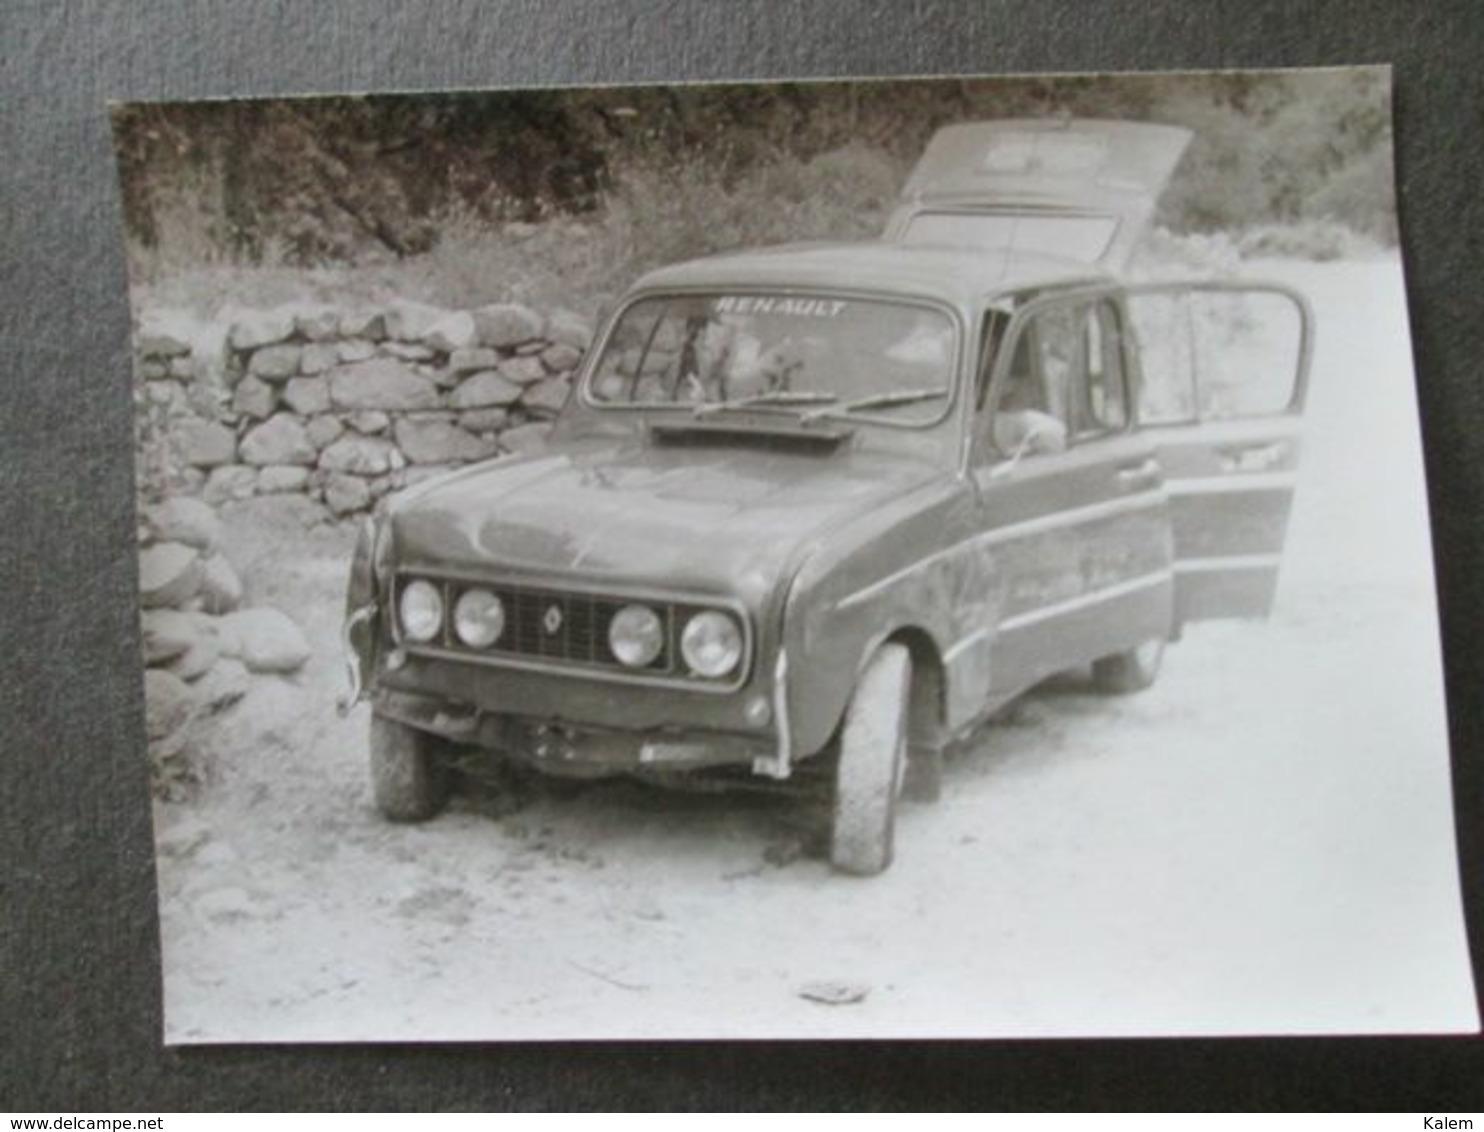 OLD RENAULT CAR ,VIEILLE VOITURE RENAULT, ORIGINAL PHOTO - Personnes Anonymes